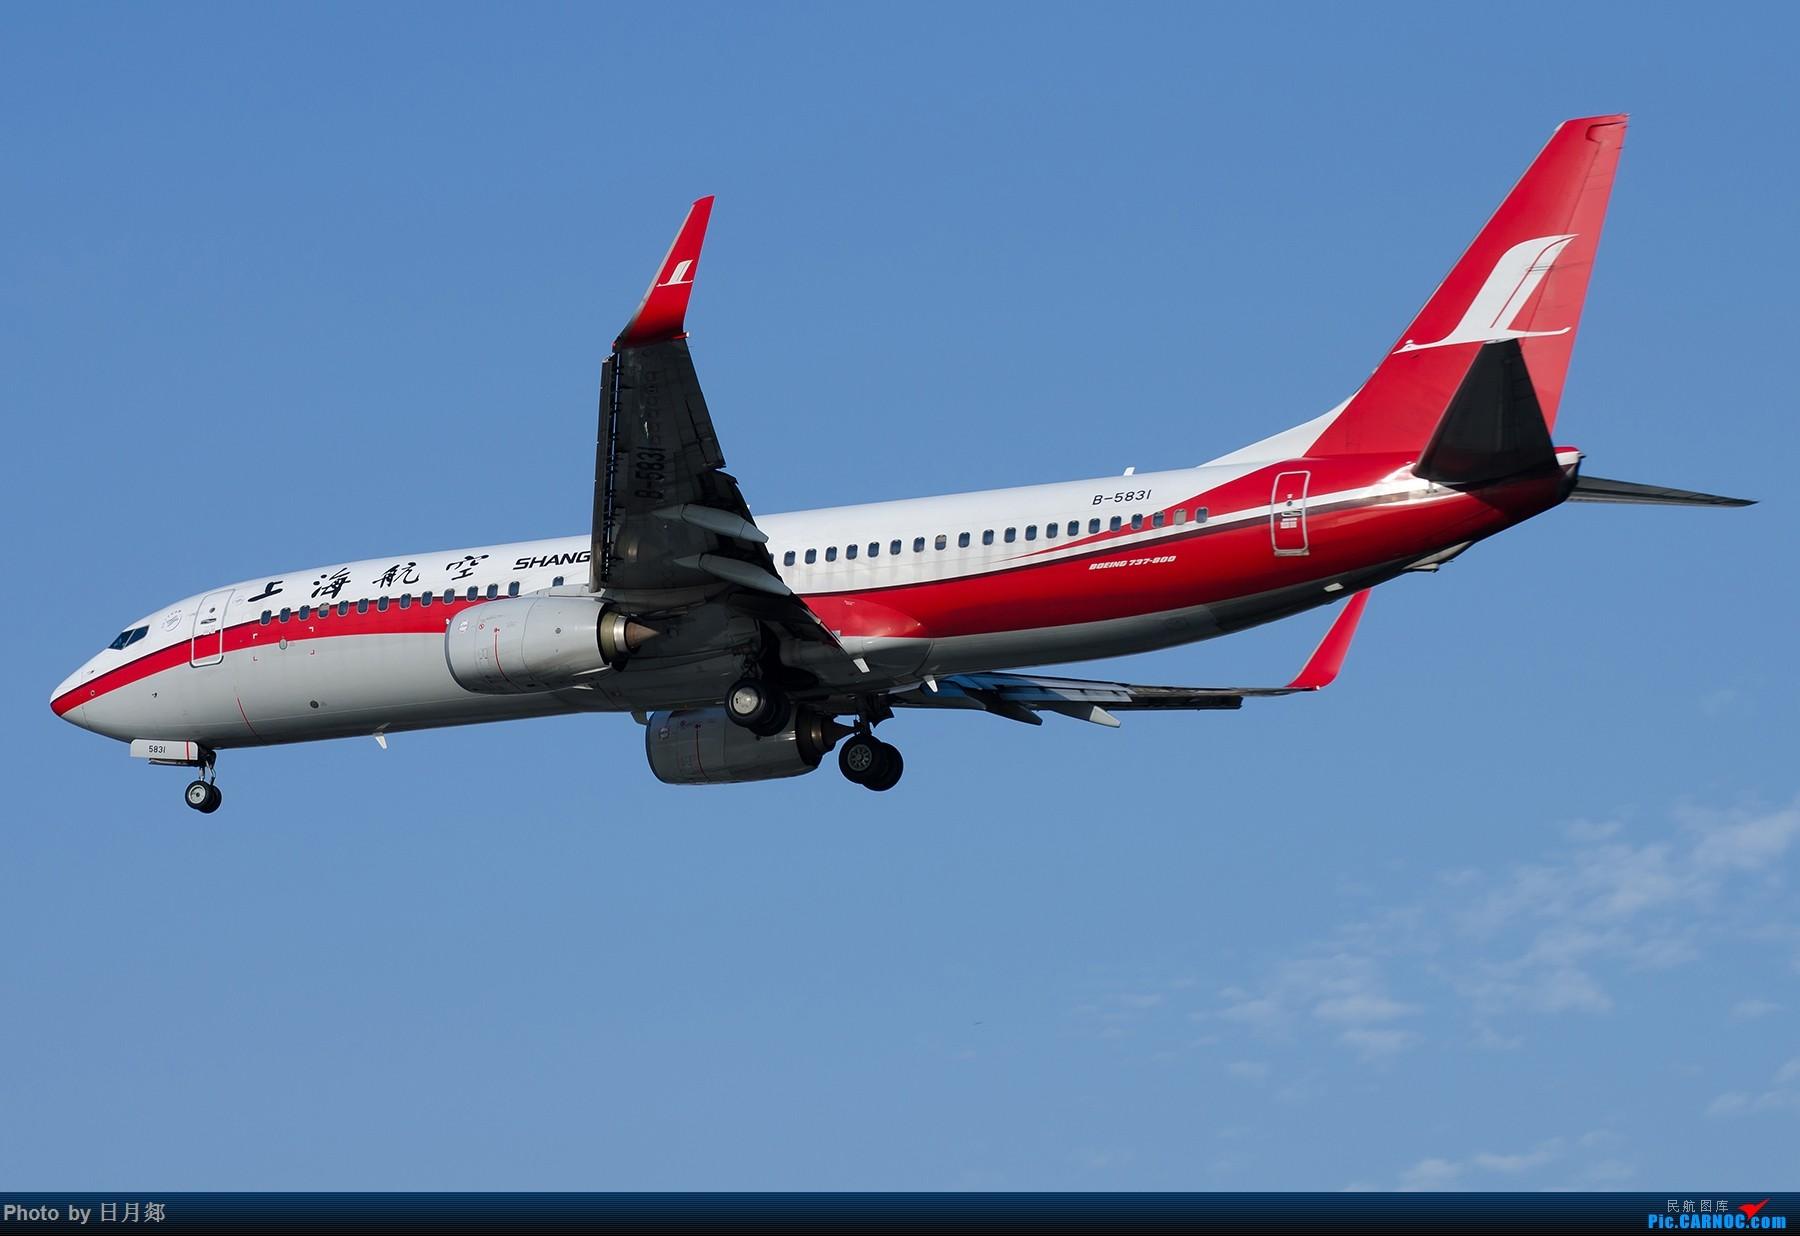 Re:[原创]【SHA拍机*1800大图】轻度污染来临前宝贵的蓝天,且拍且珍惜 BOEING 737-800 B-5831 中国上海虹桥国际机场